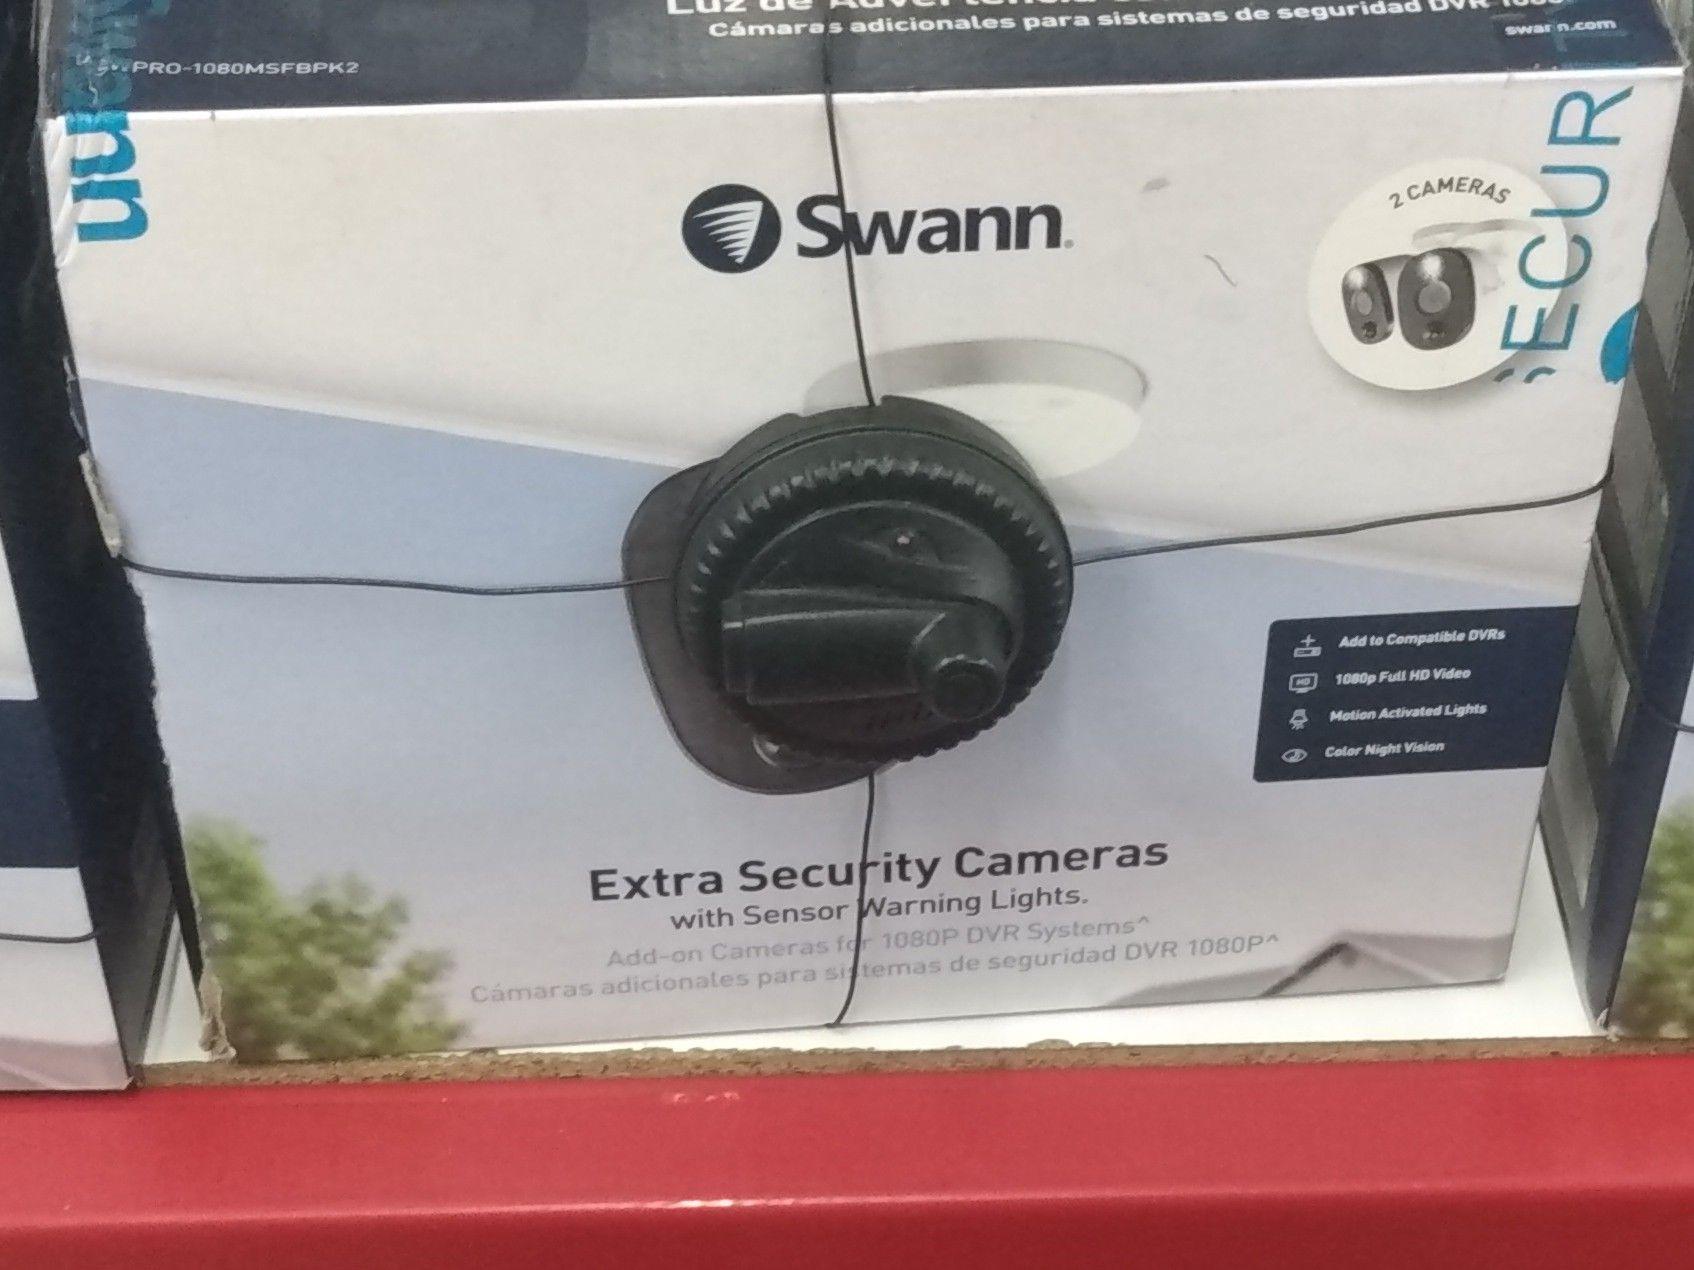 Sam's Club: Cámaras de Seguridad Swann Full HD 1080p 2 Pzas (Tlaquepaque)